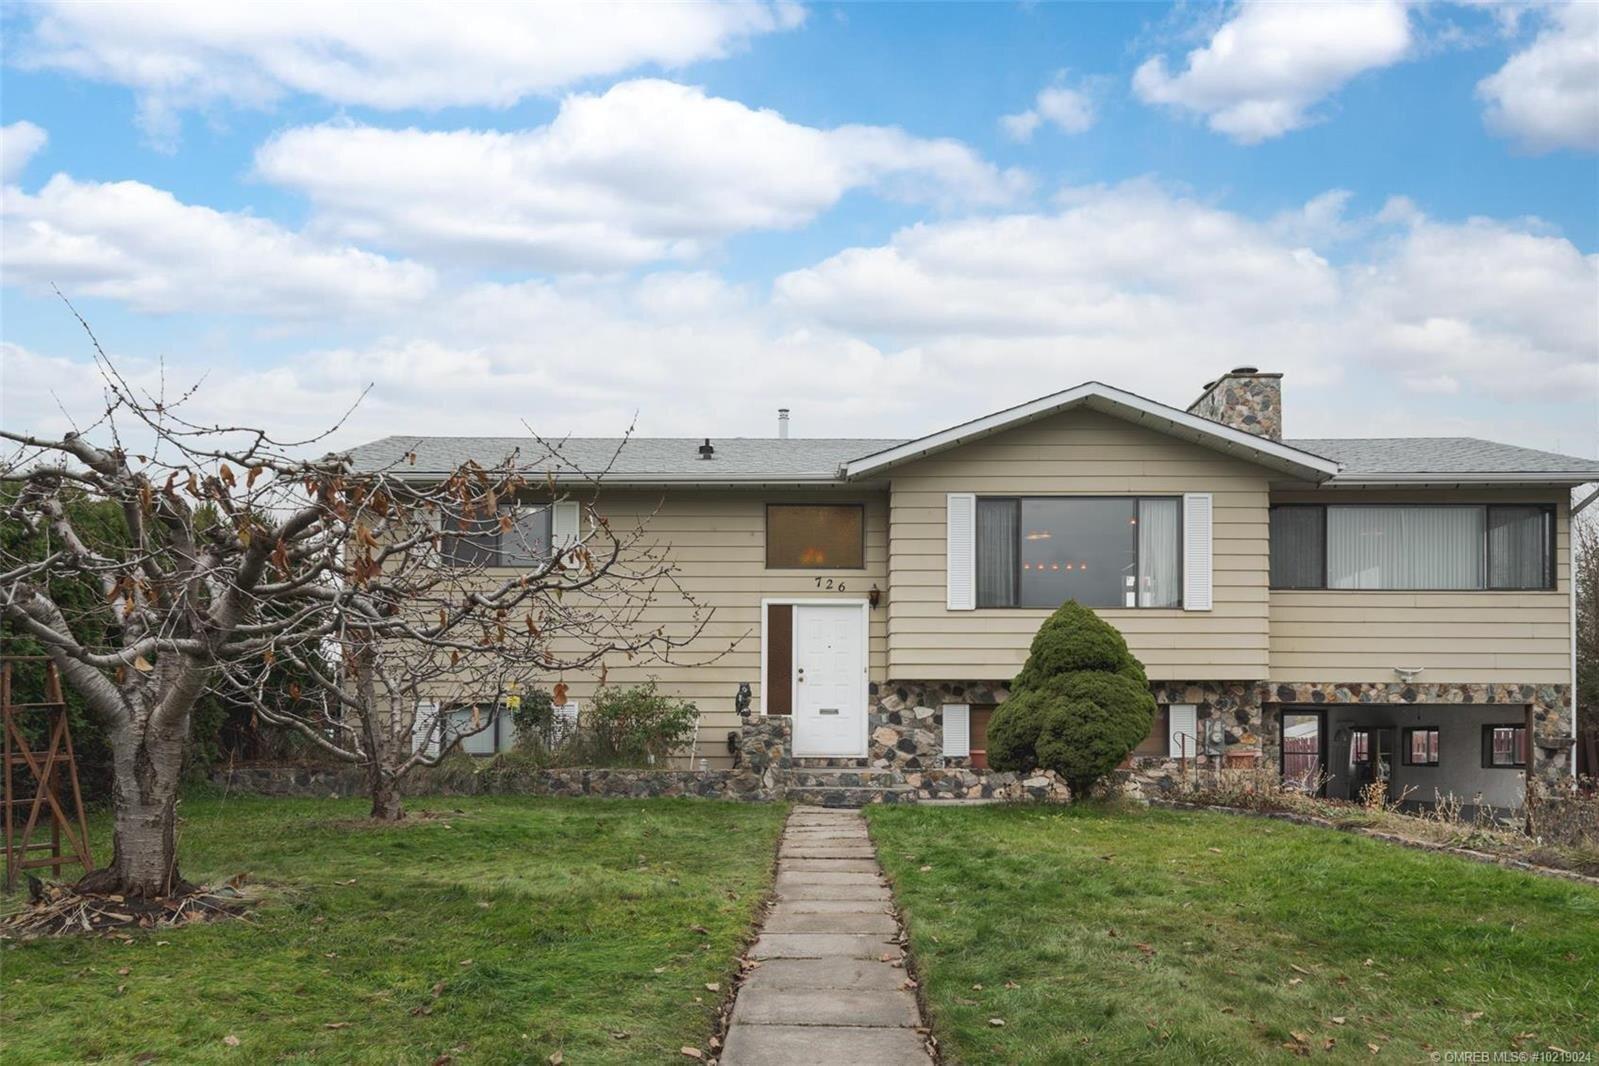 House for sale at 726 Renshaw Rd Kelowna British Columbia - MLS: 10219024